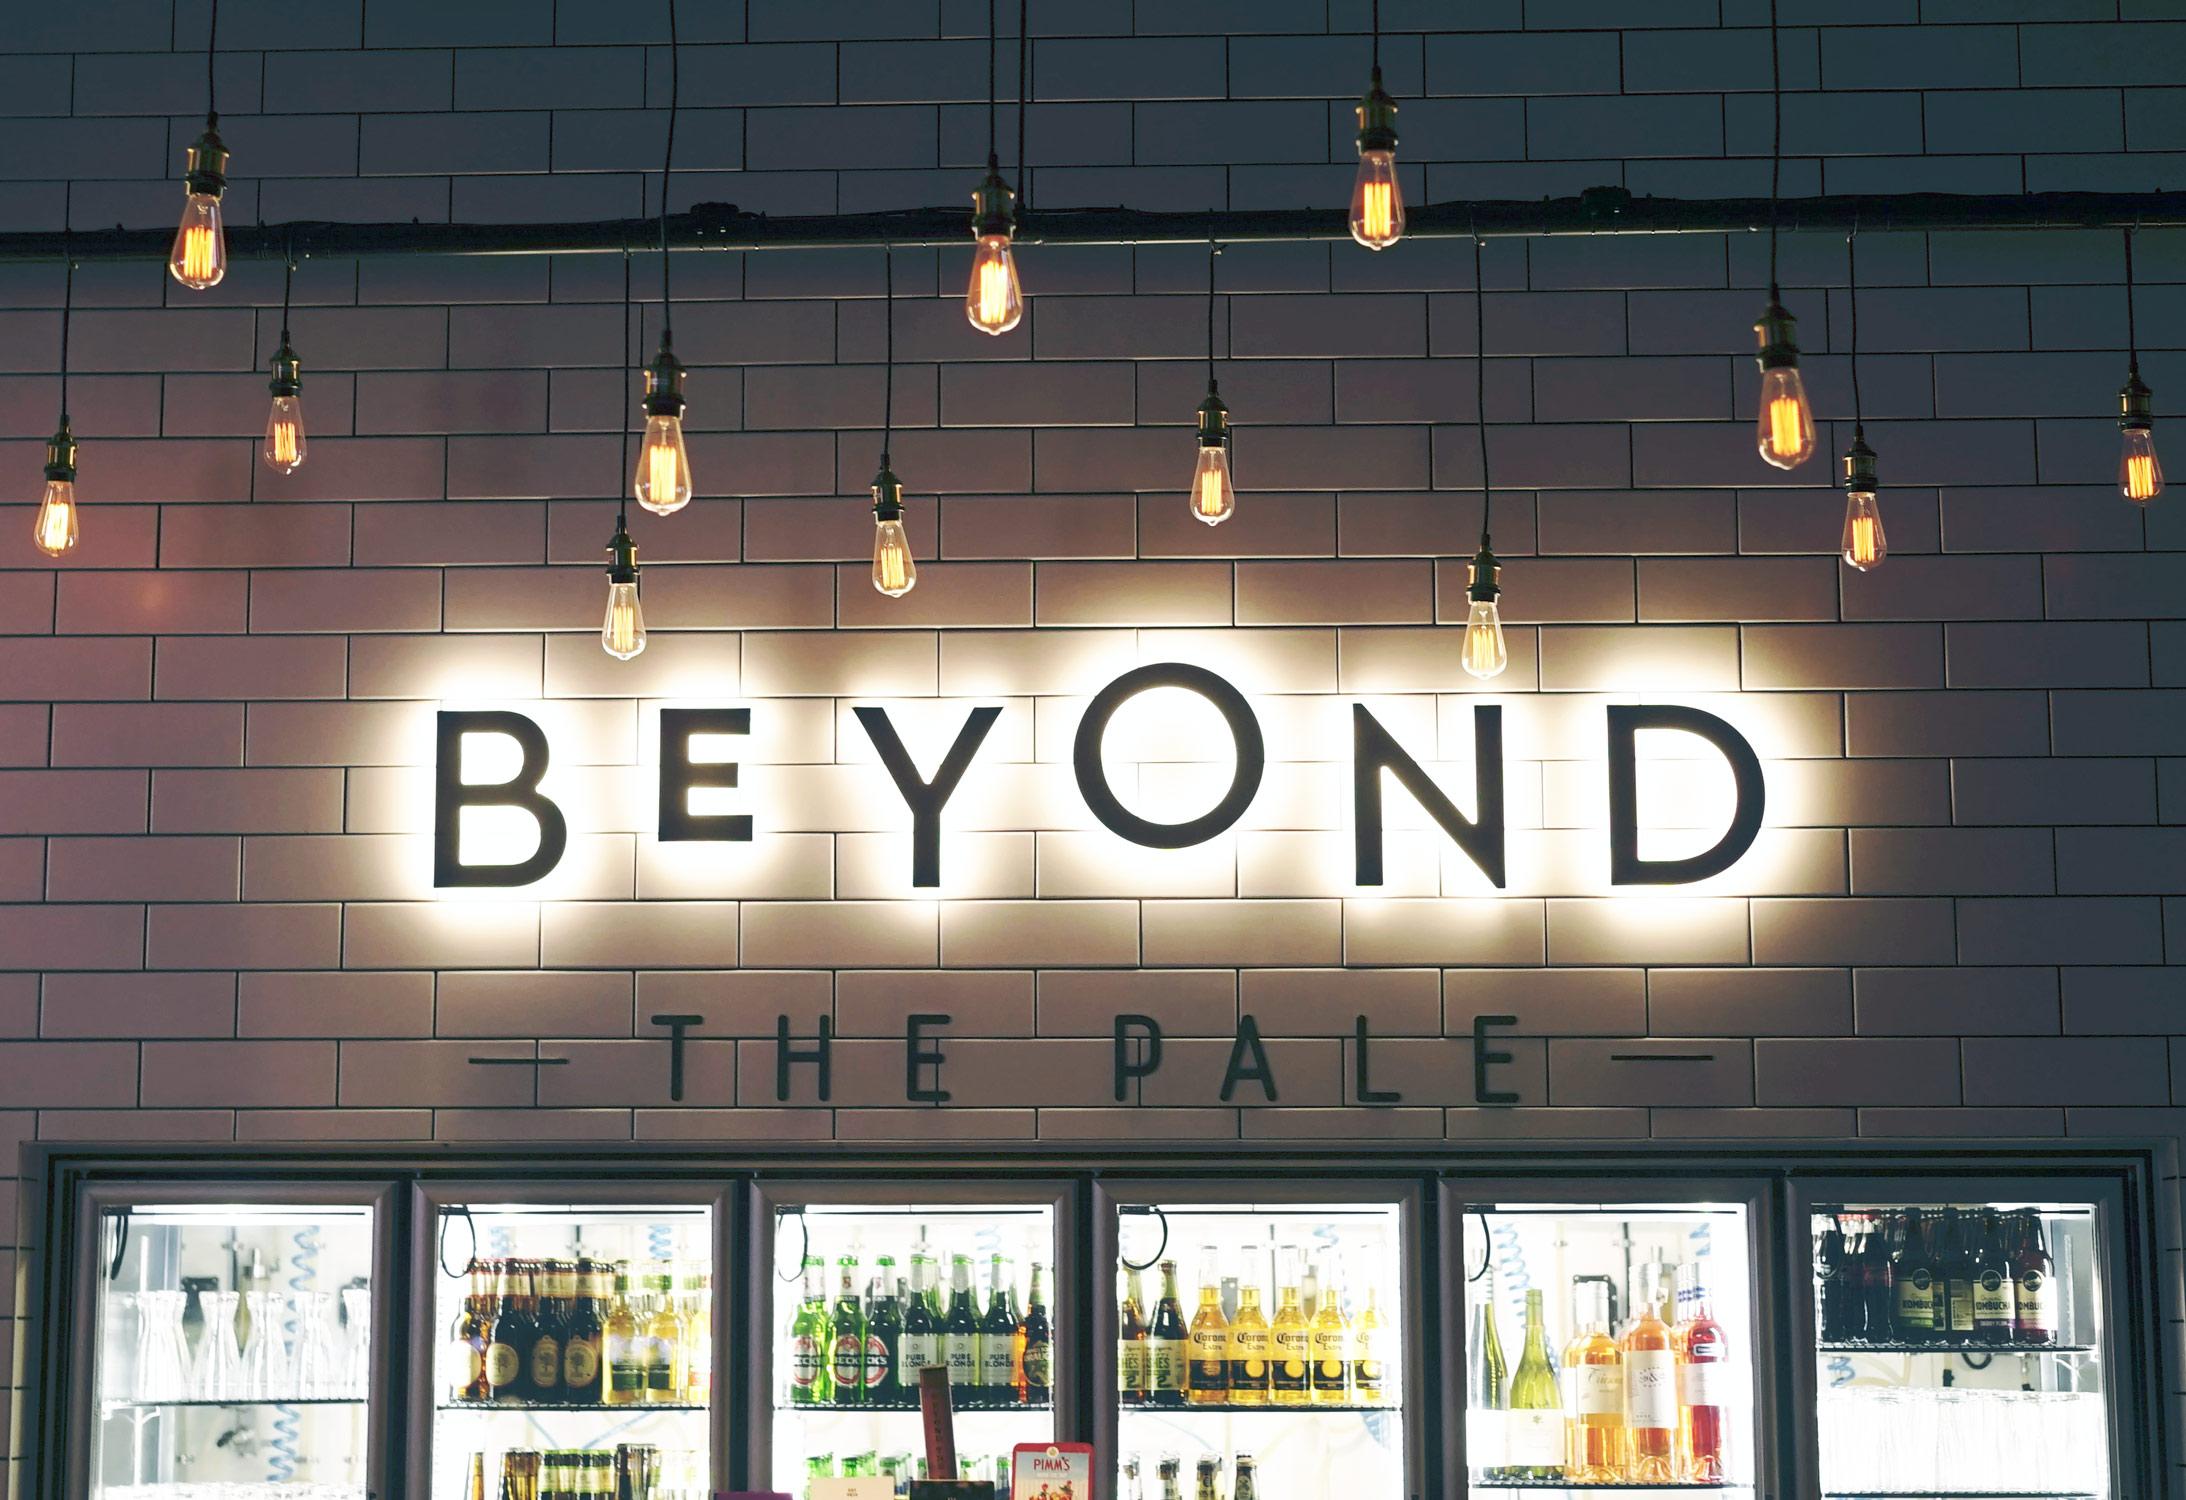 BeyondthePaleBehindBar